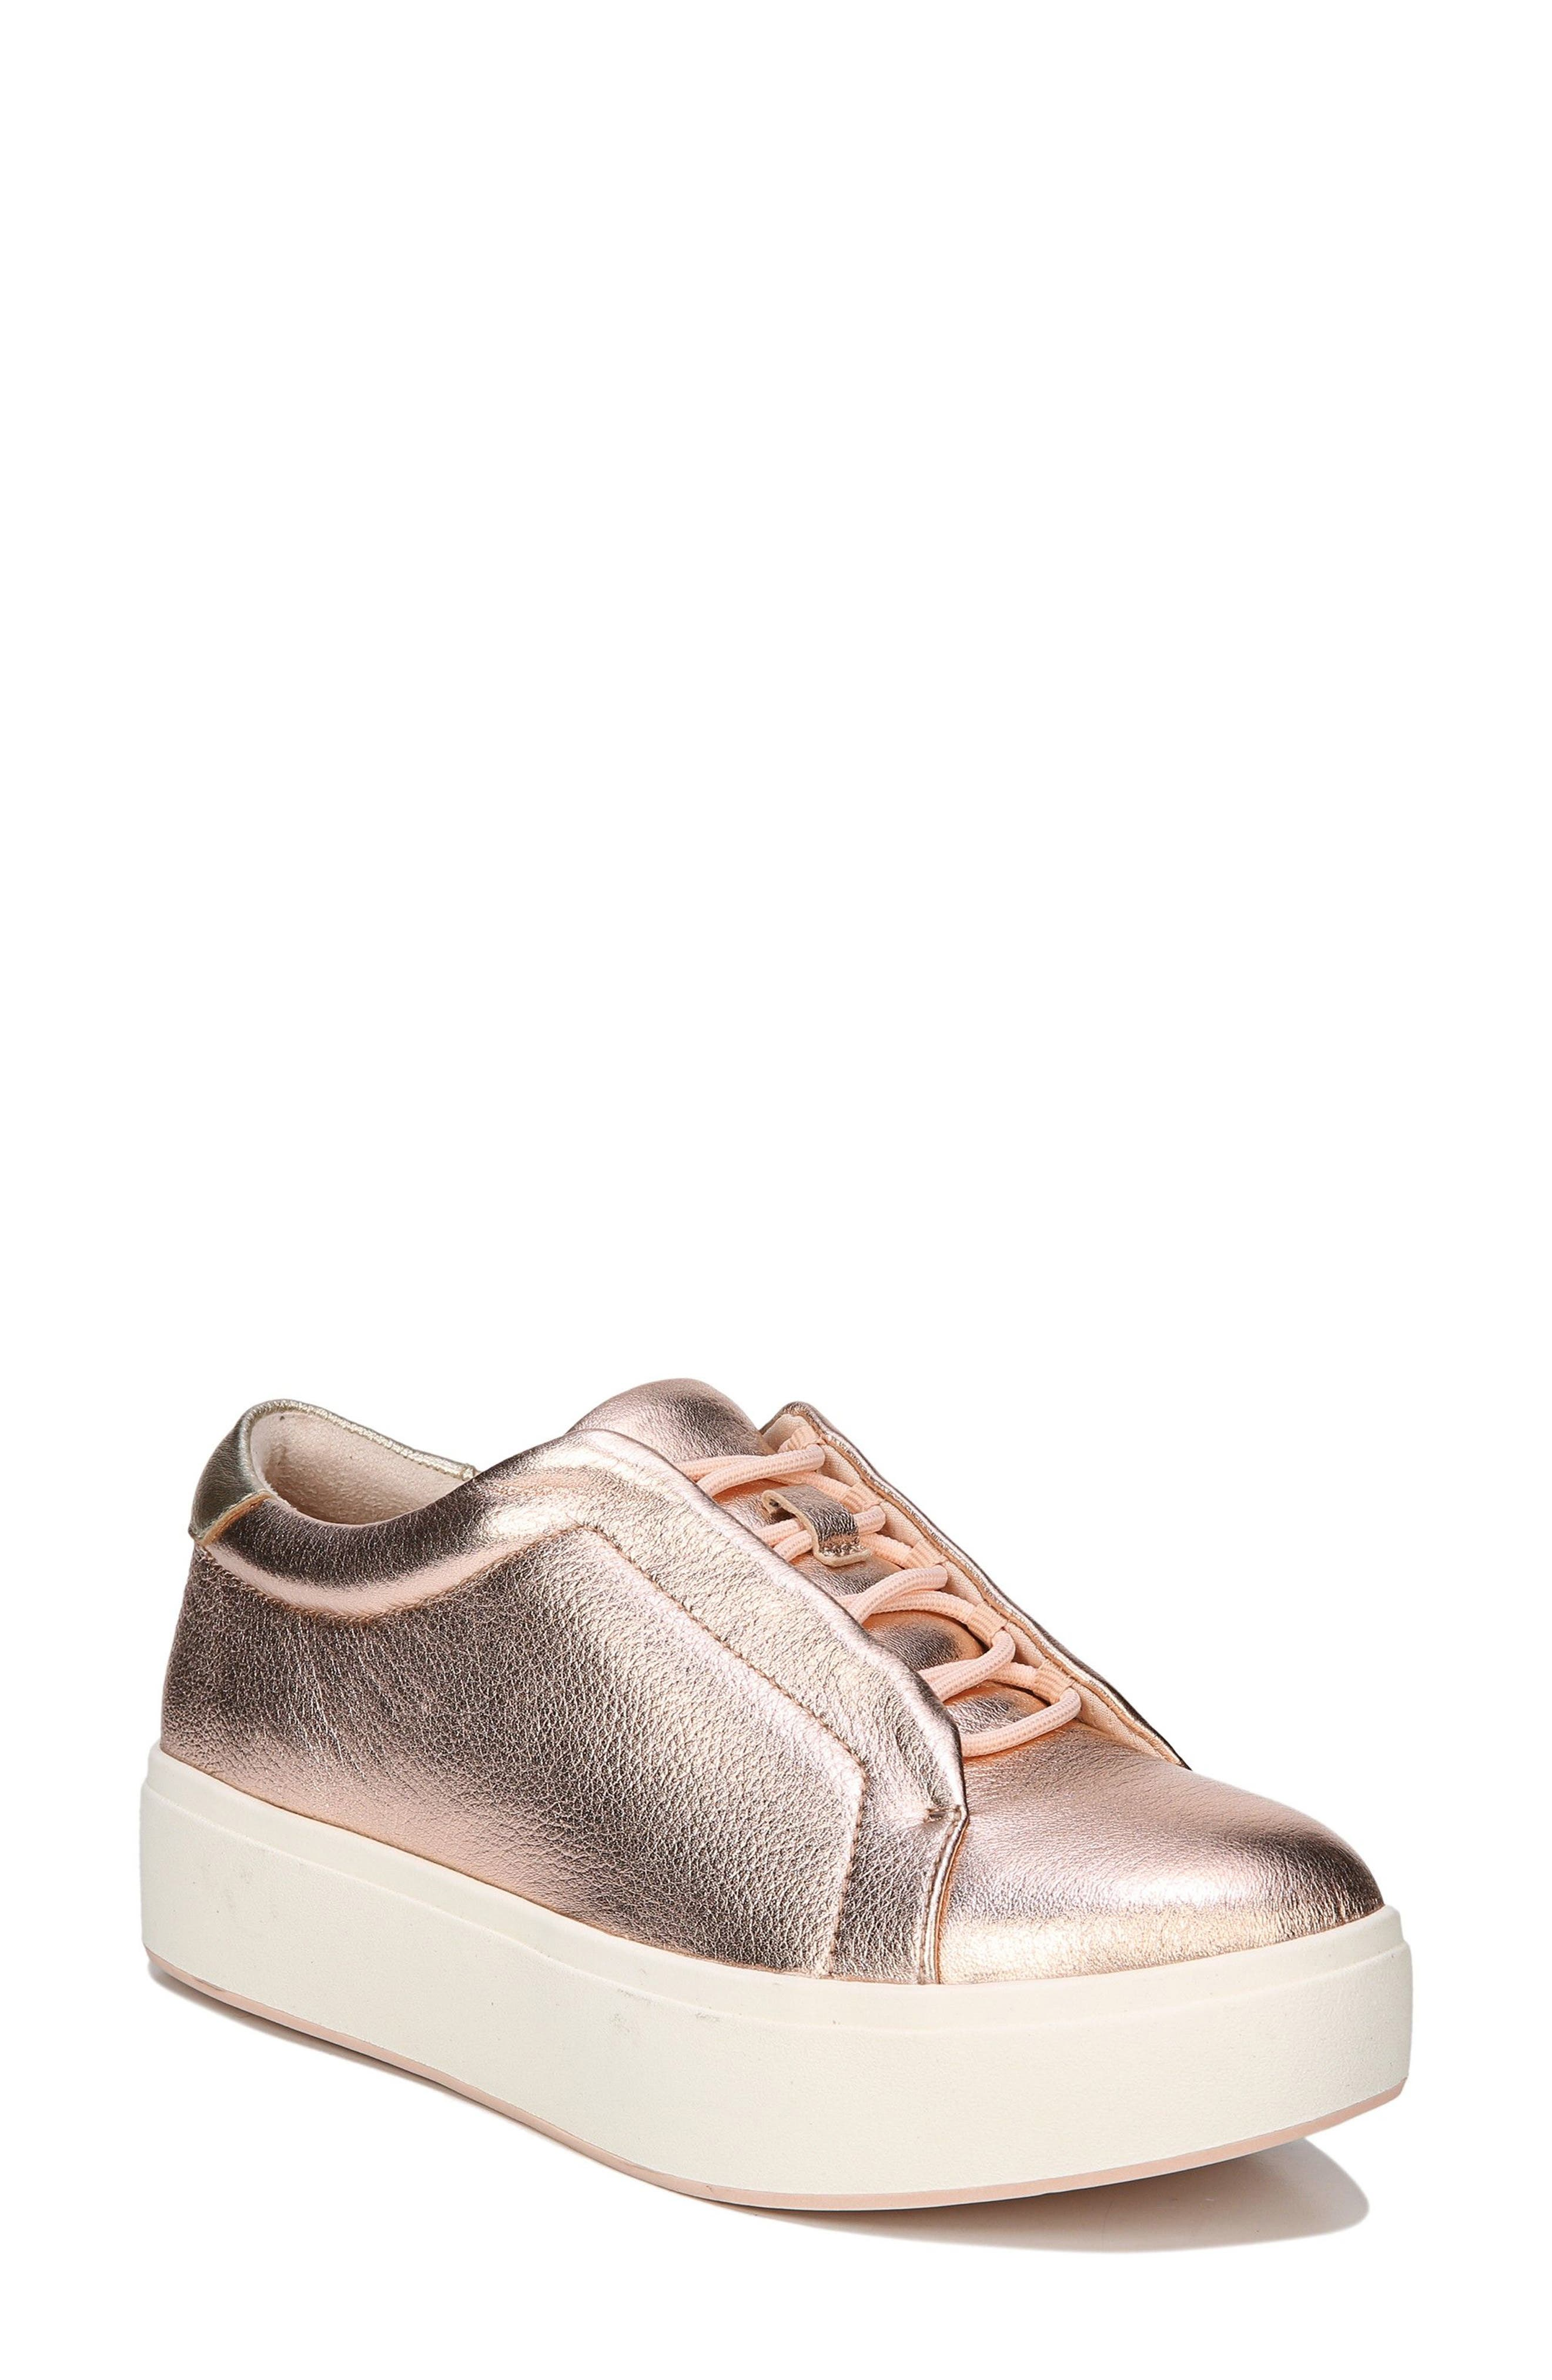 Main Image - Dr. Scholl's Abbot Sneaker (Women)